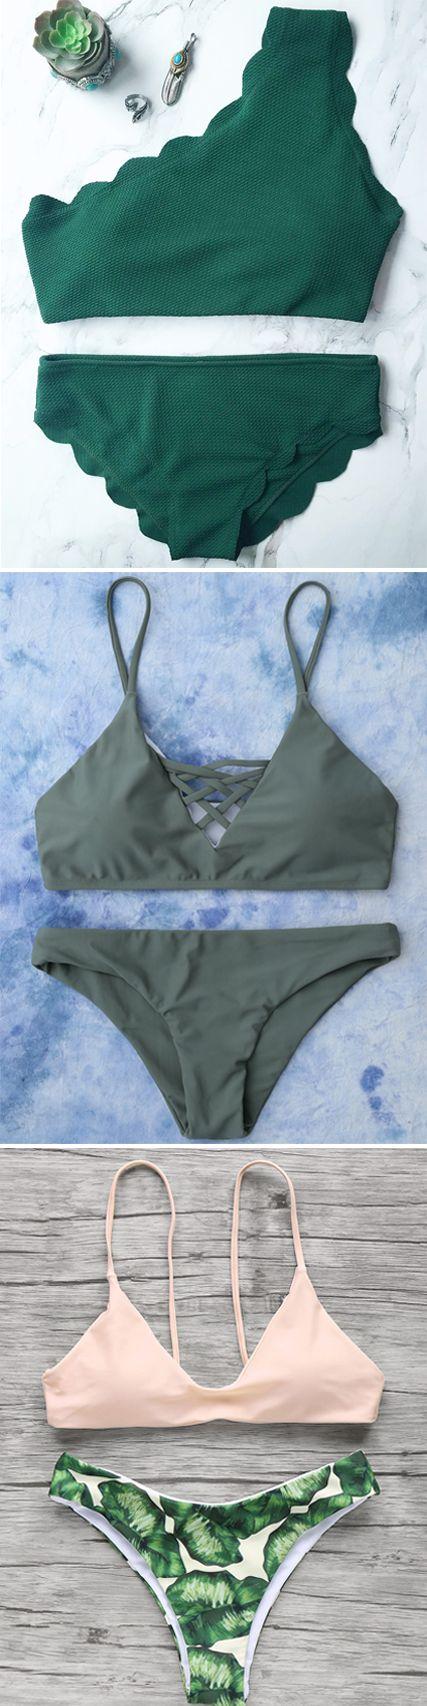 Swimwear in Zaful |swimsuits,bathing suit,bikini,bikini set,one pieces,swimwear 2017,beach outfit,bikinis,beach,beach wear,Hawaii,summer bikinis,st patricks,st patricks day,st patrick's day | #stpatricks